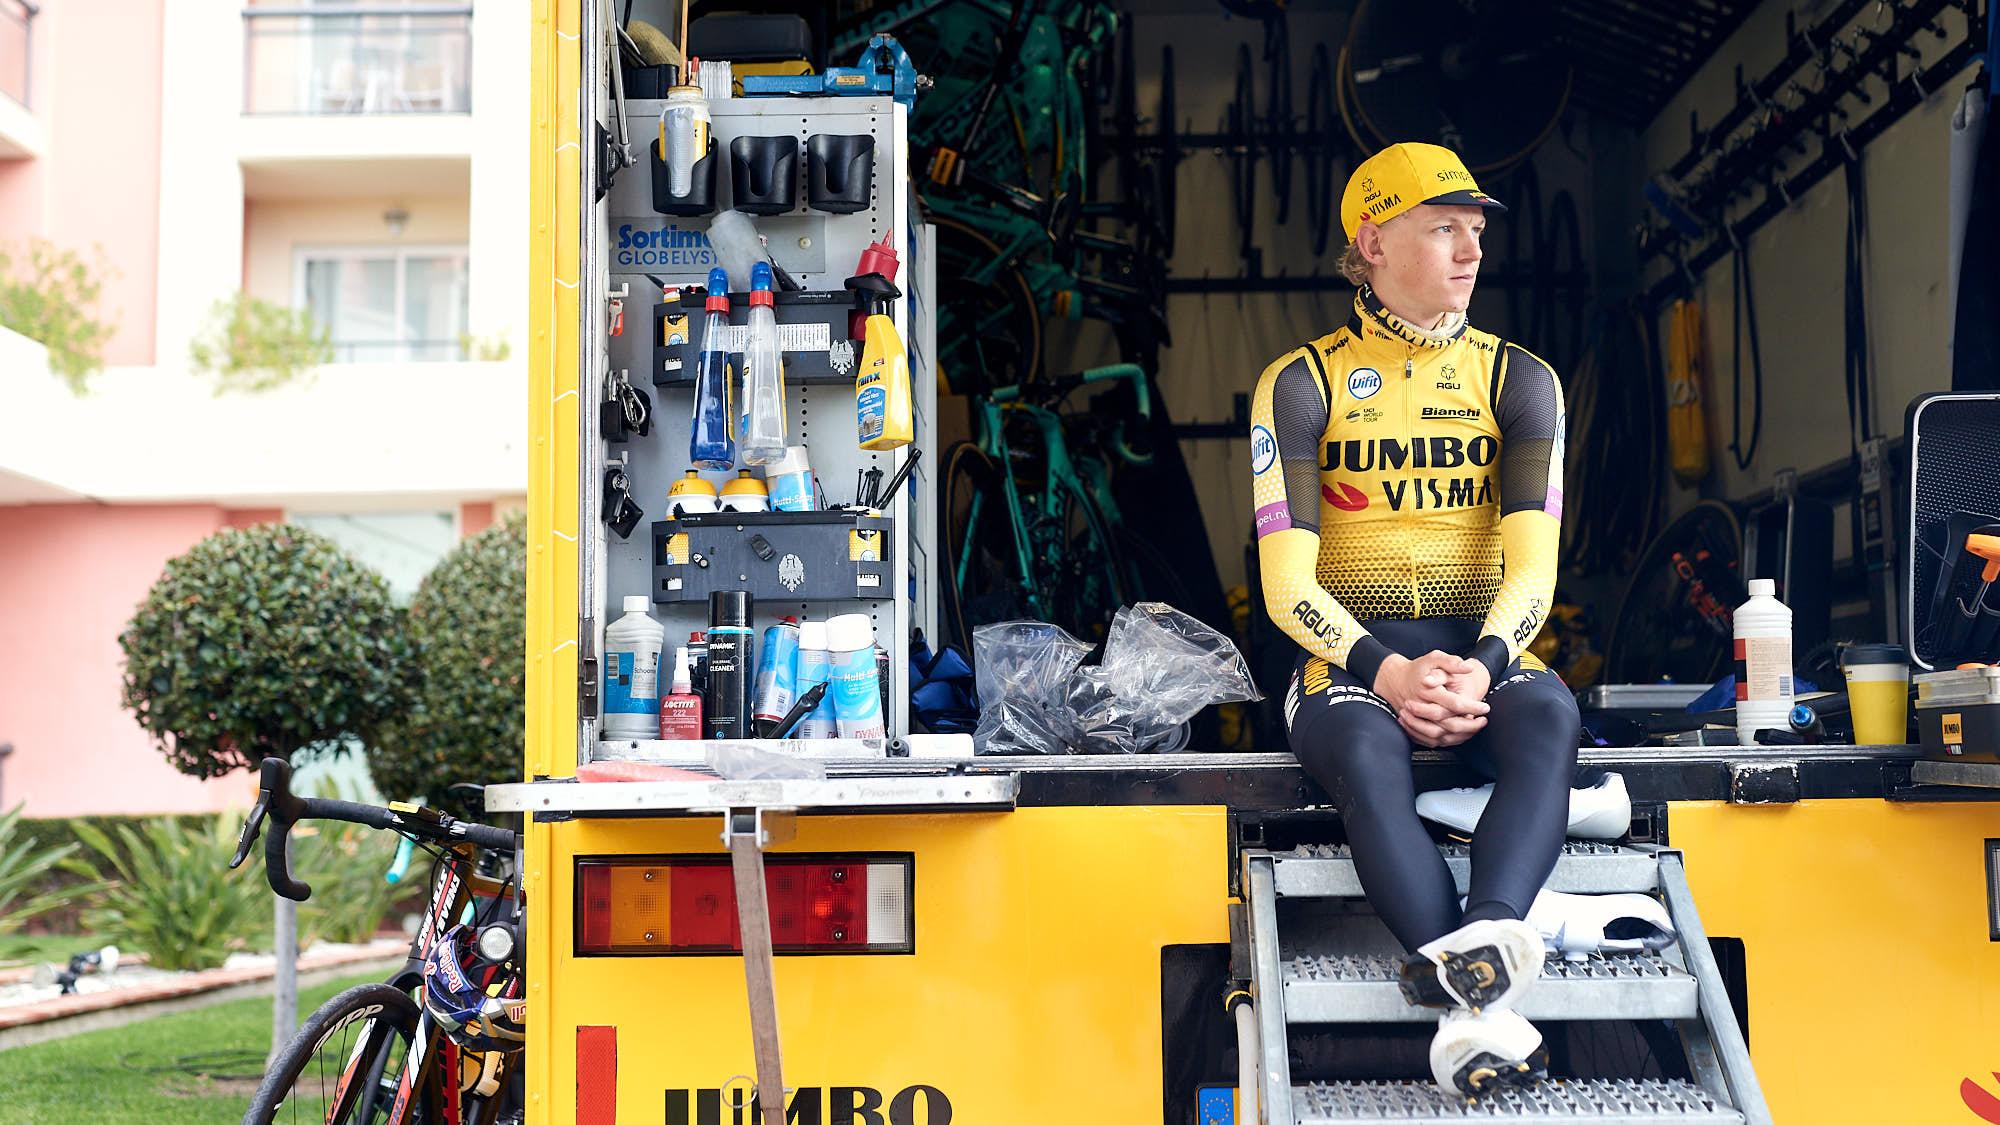 Cyclist Koen Bouwman in the mechanics' truck before training